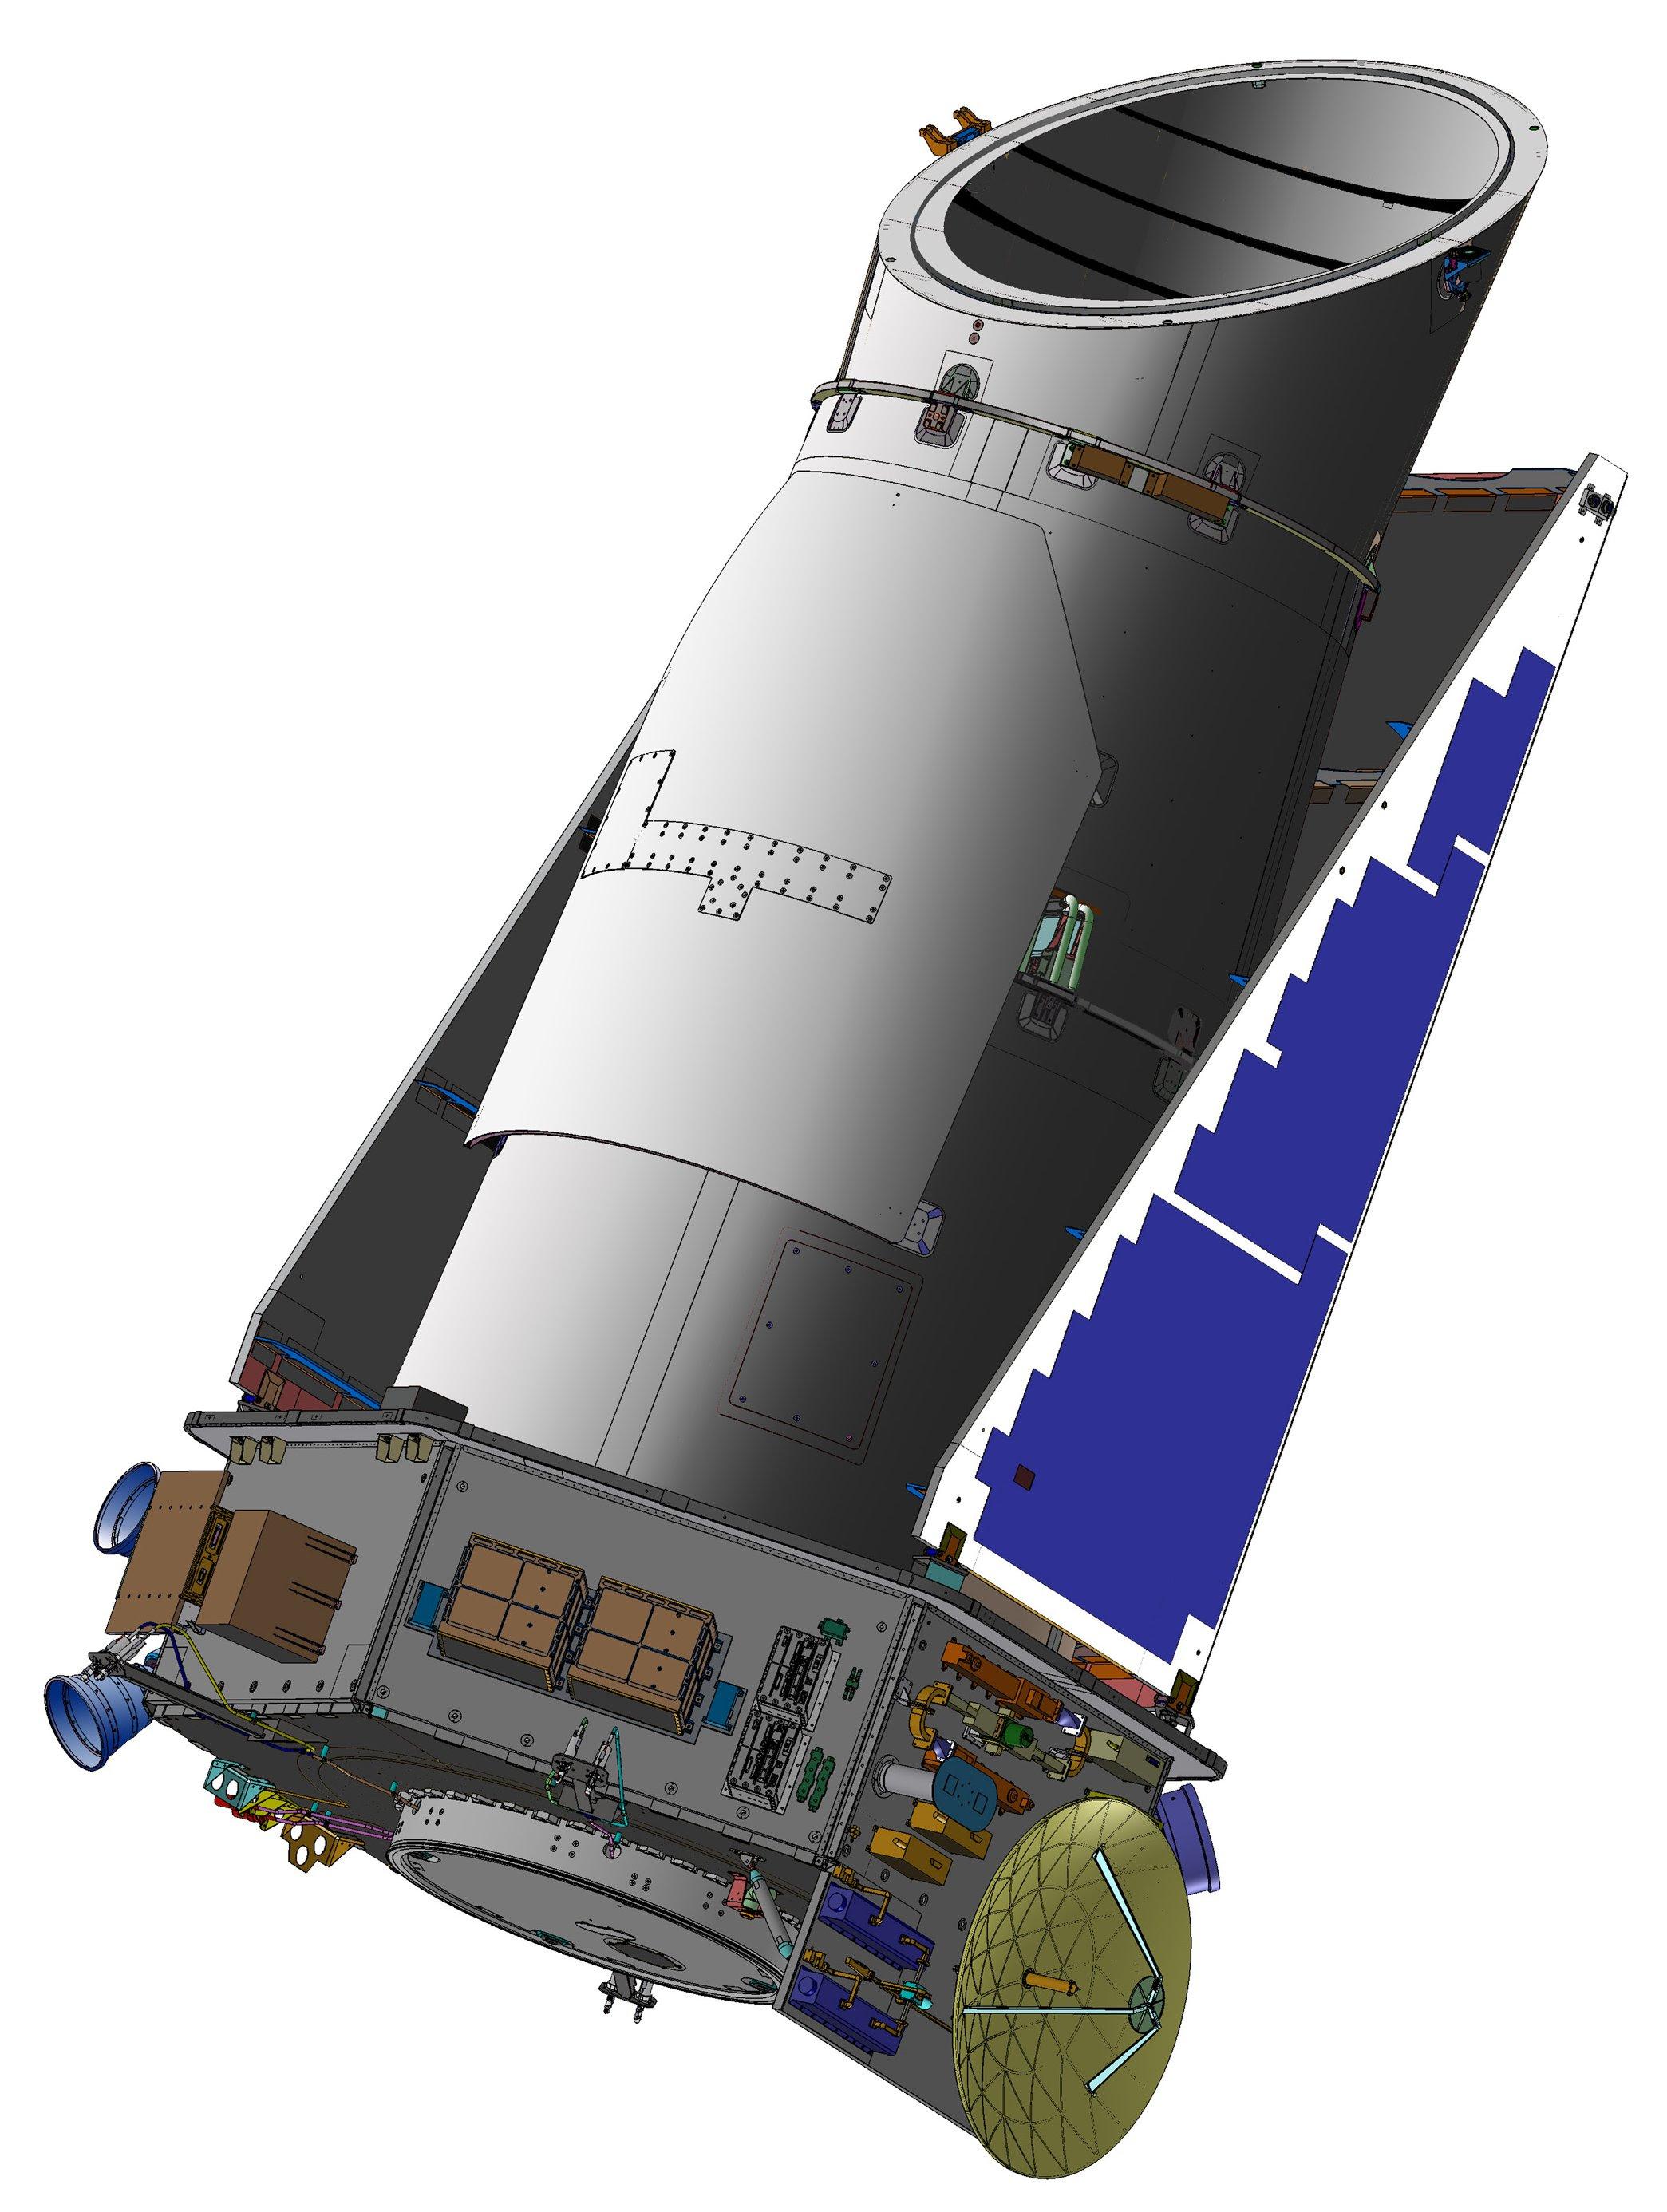 http://upload.wikimedia.org/wikipedia/commons/f/f7/Kepler_Space_Telescope.jpg